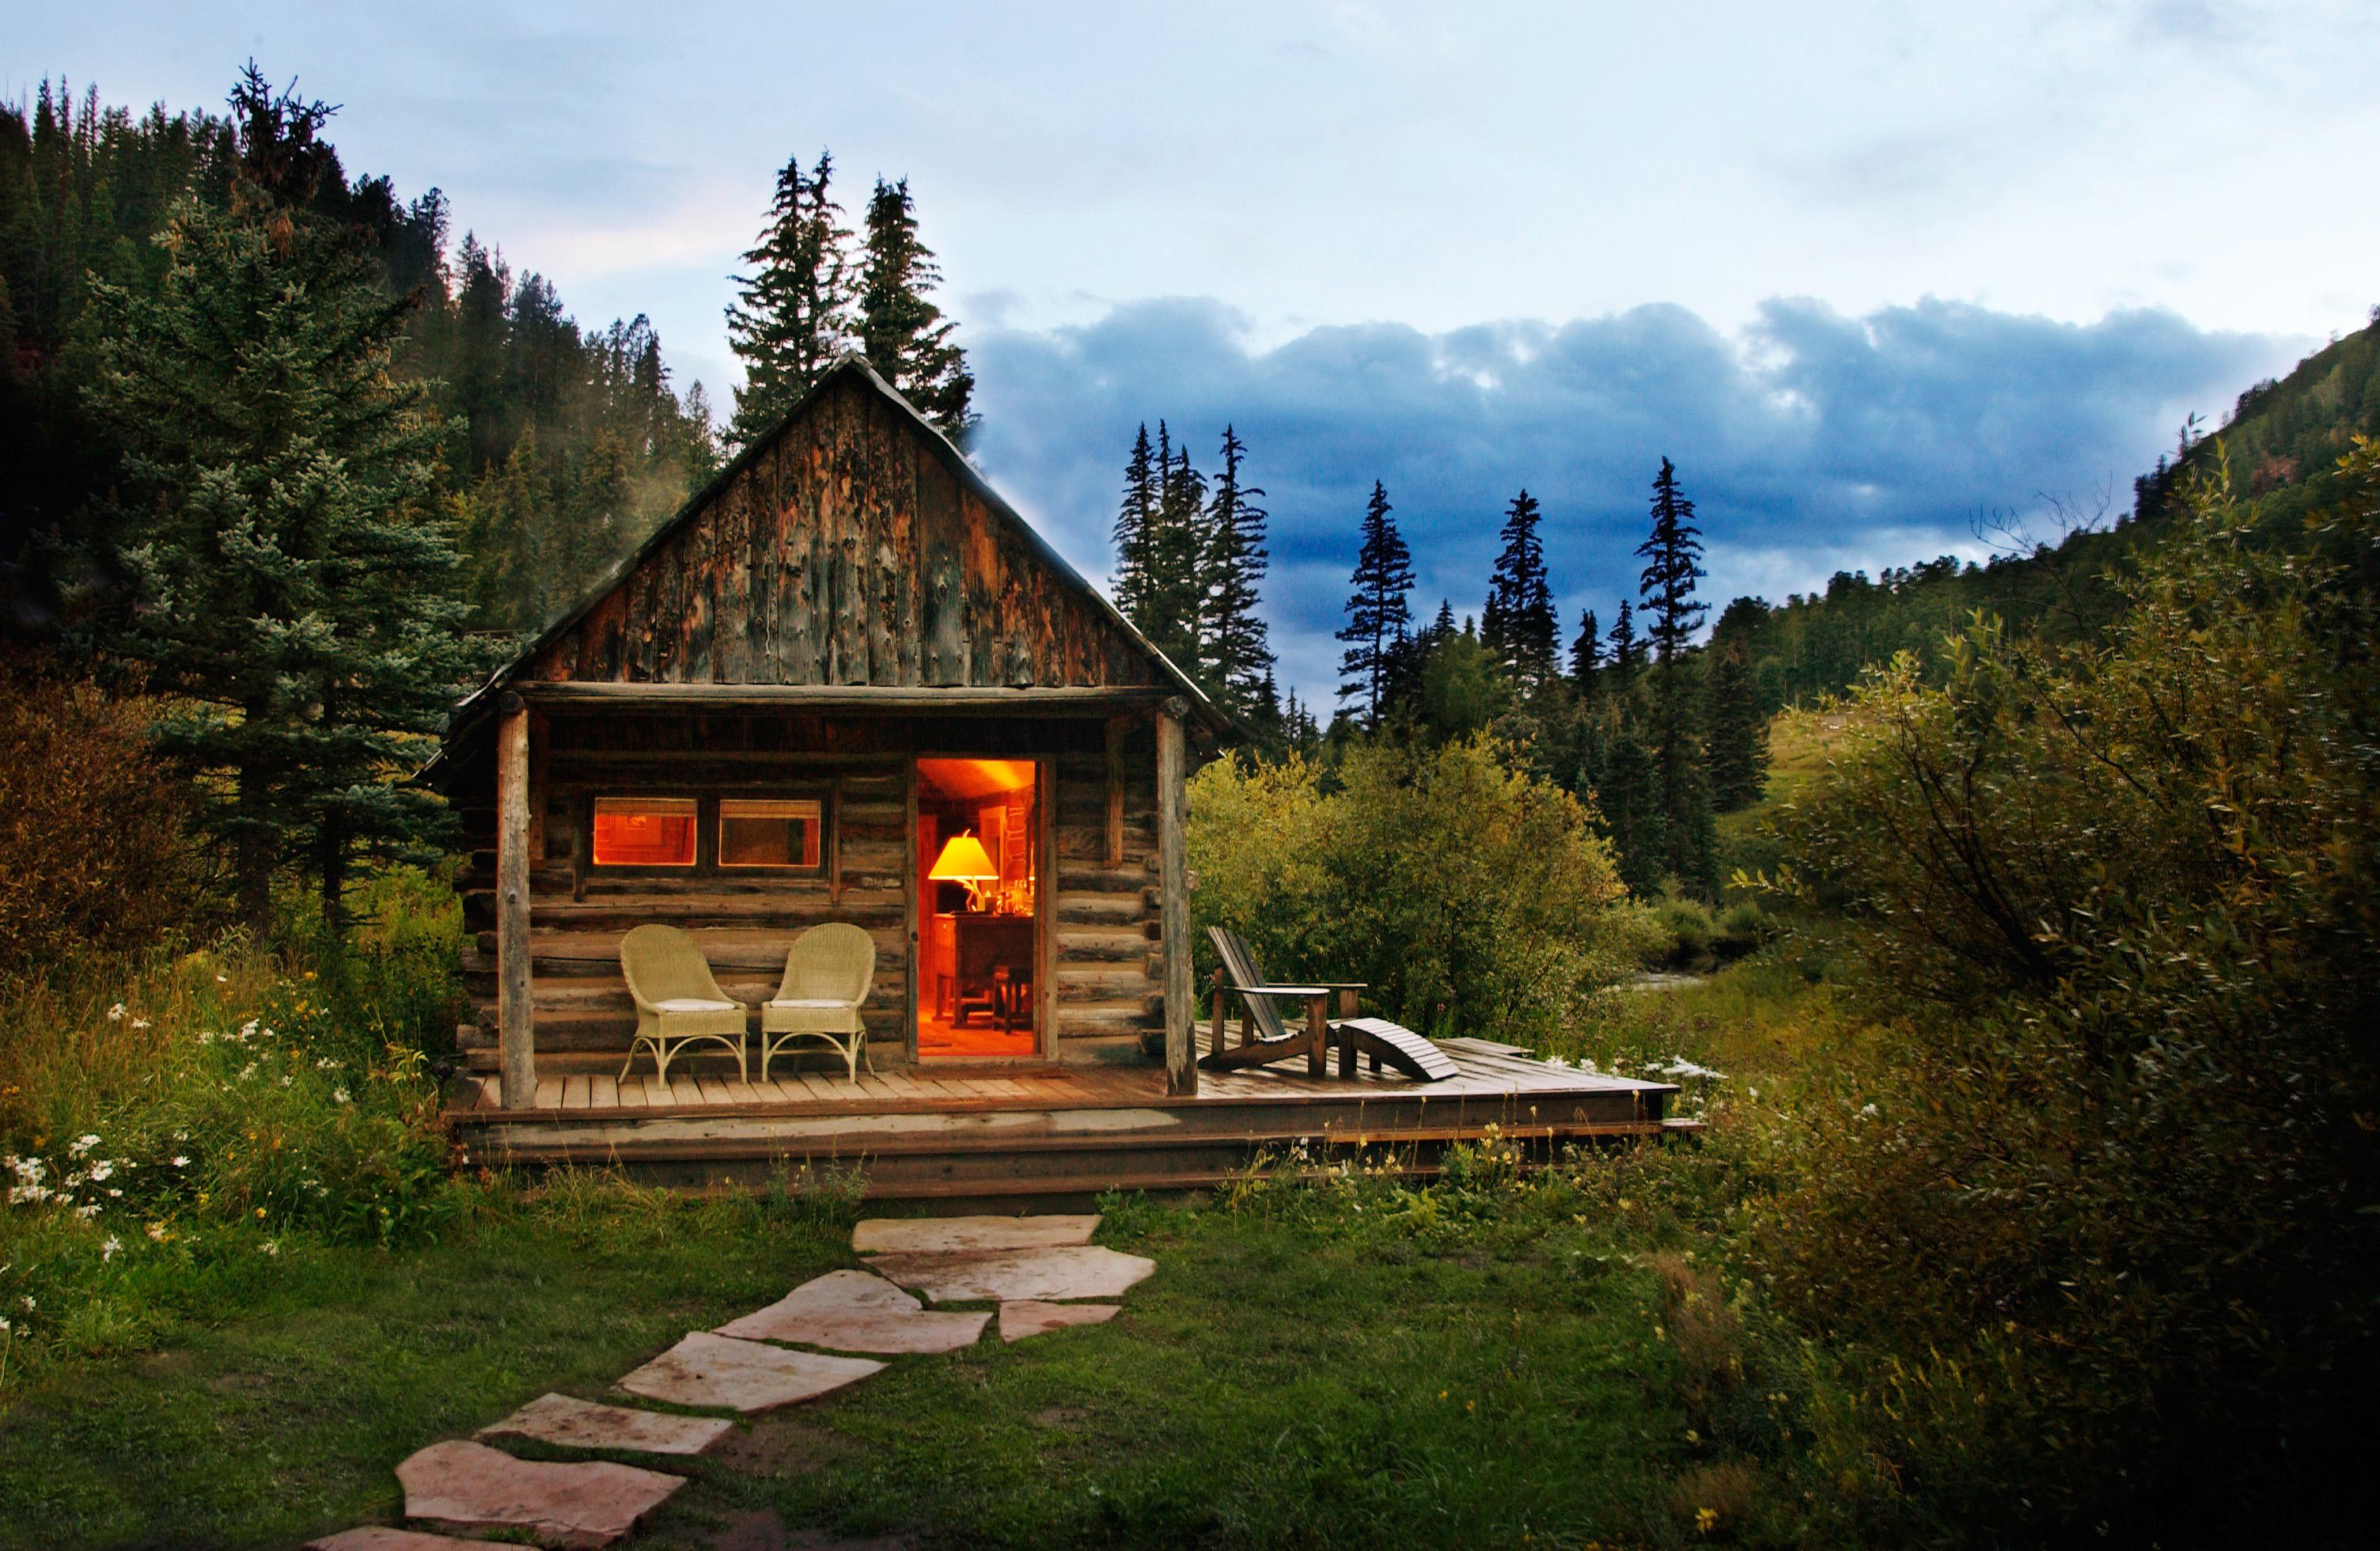 dude ranch honeymoon dunton hot springs cabin sky stone path